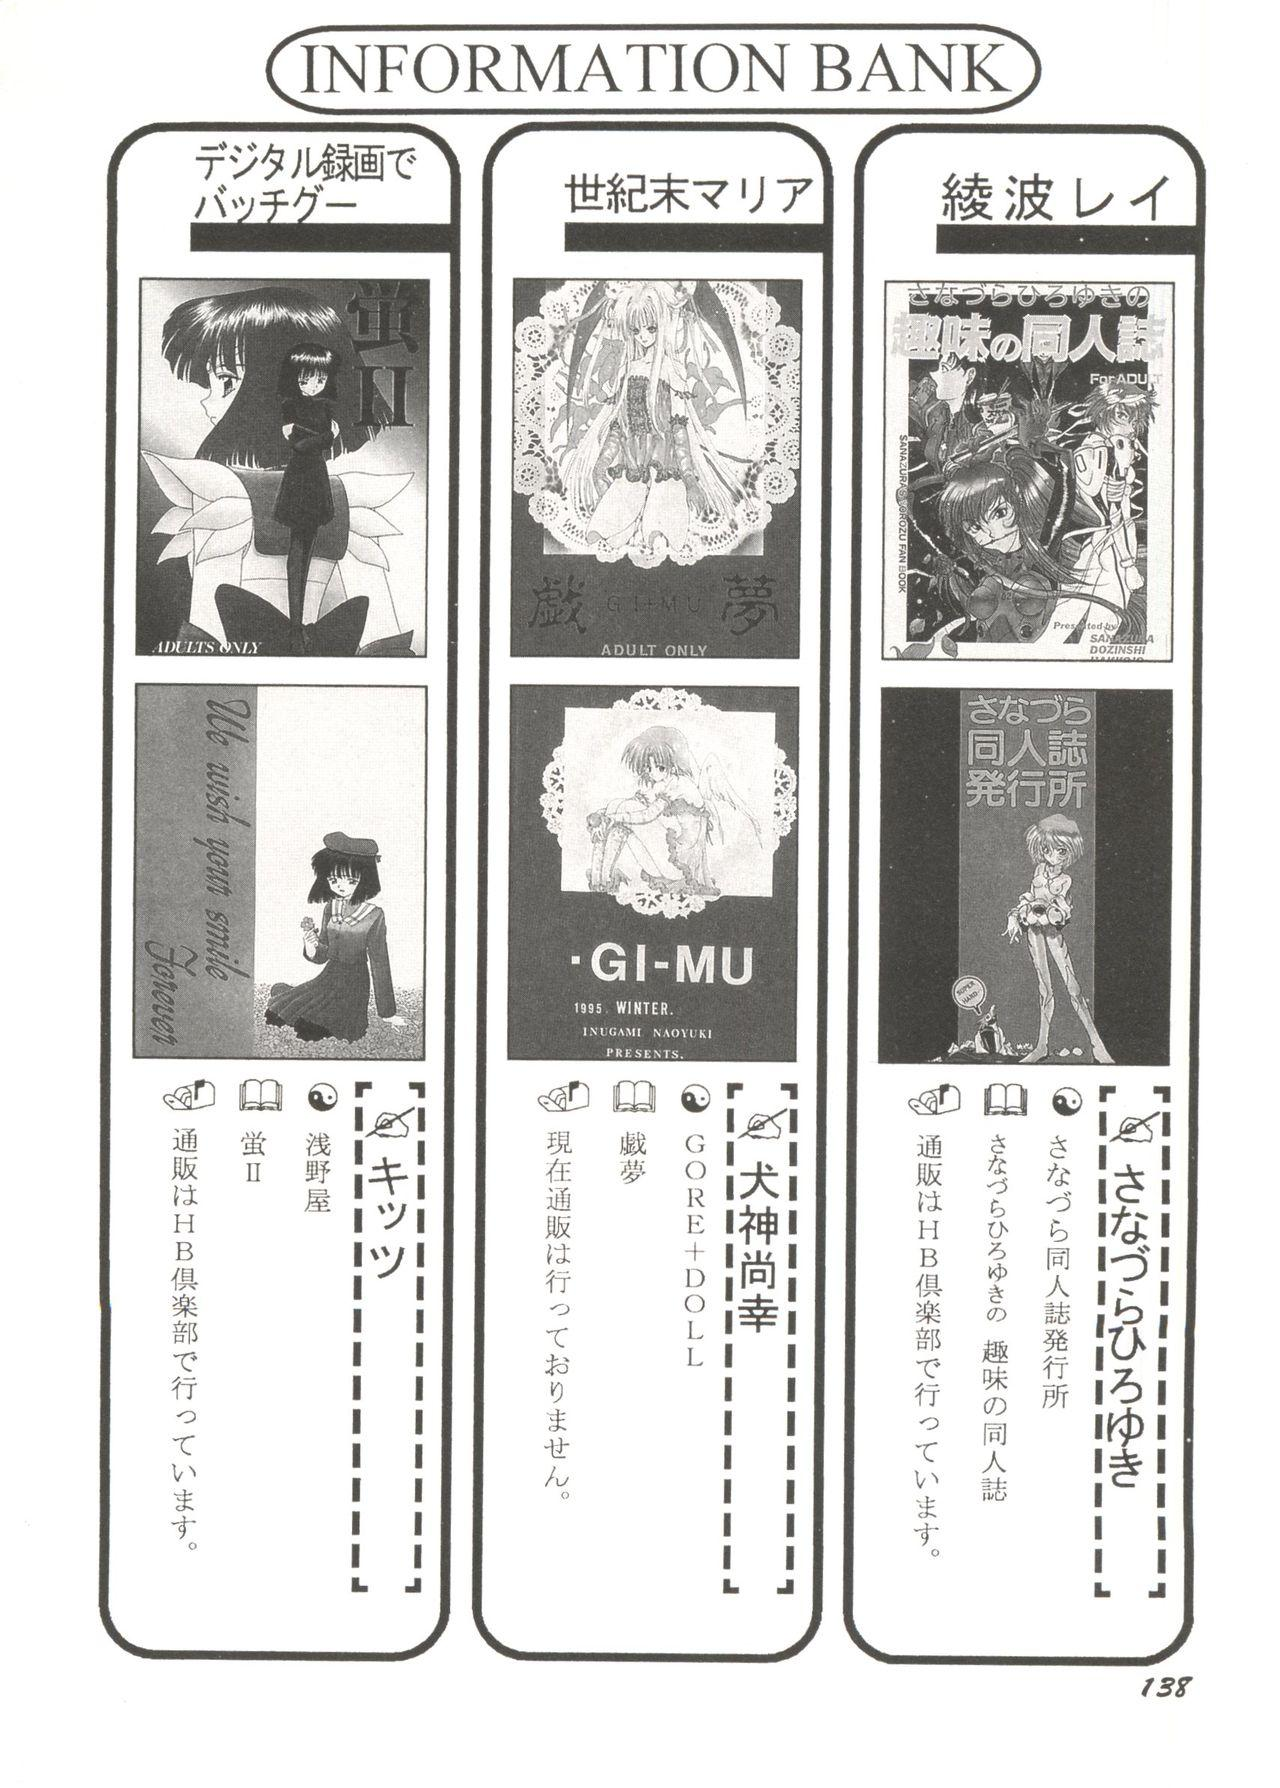 Bishoujo Doujin Peach Club - Pretty Gal's Fanzine Peach Club 9 139